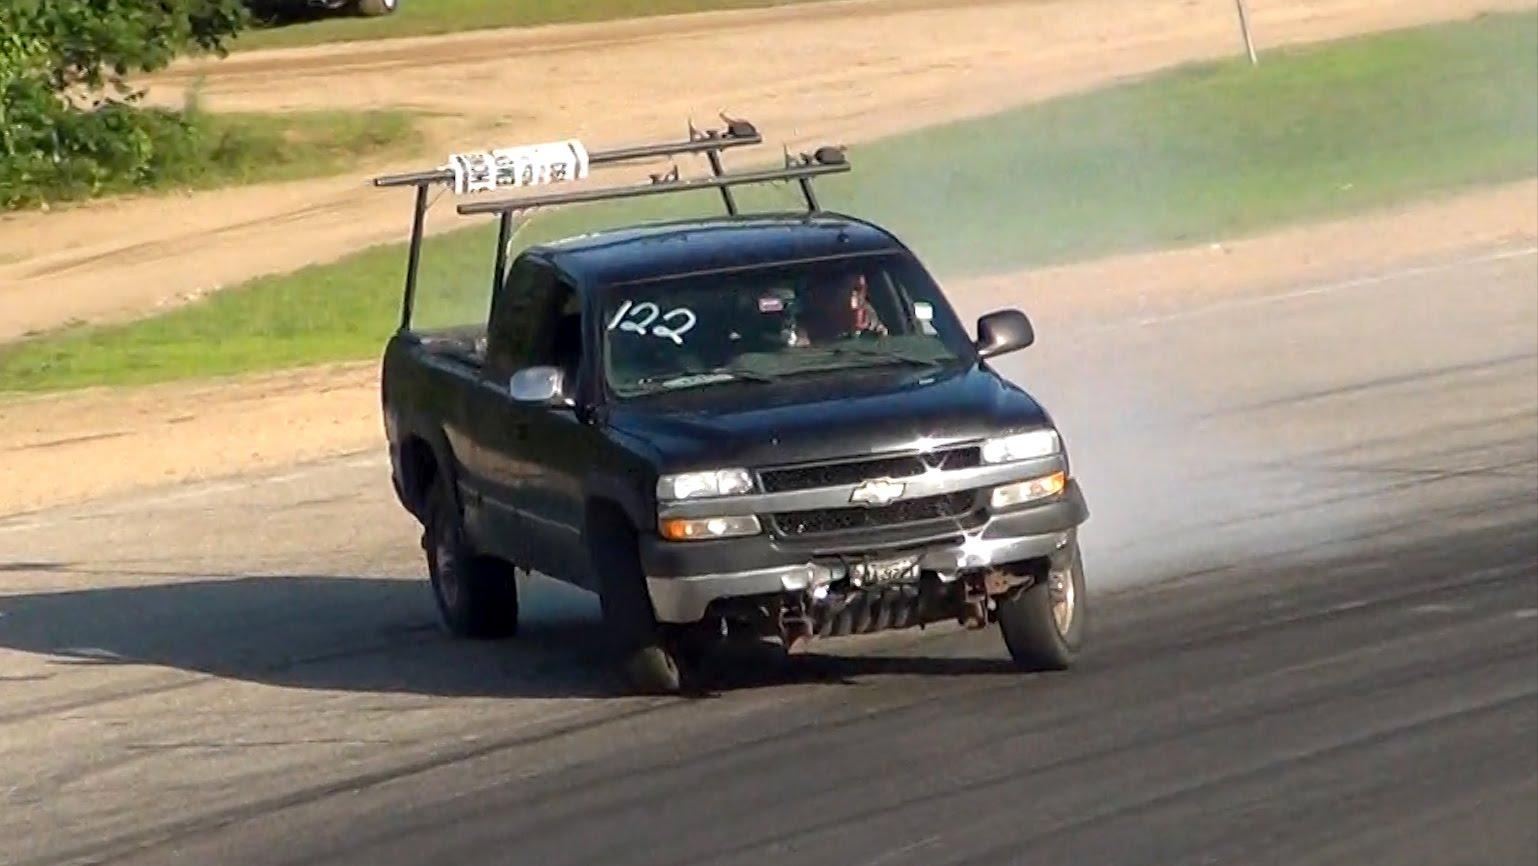 Chevy Silverado Work Truck Drifting Big No Car No